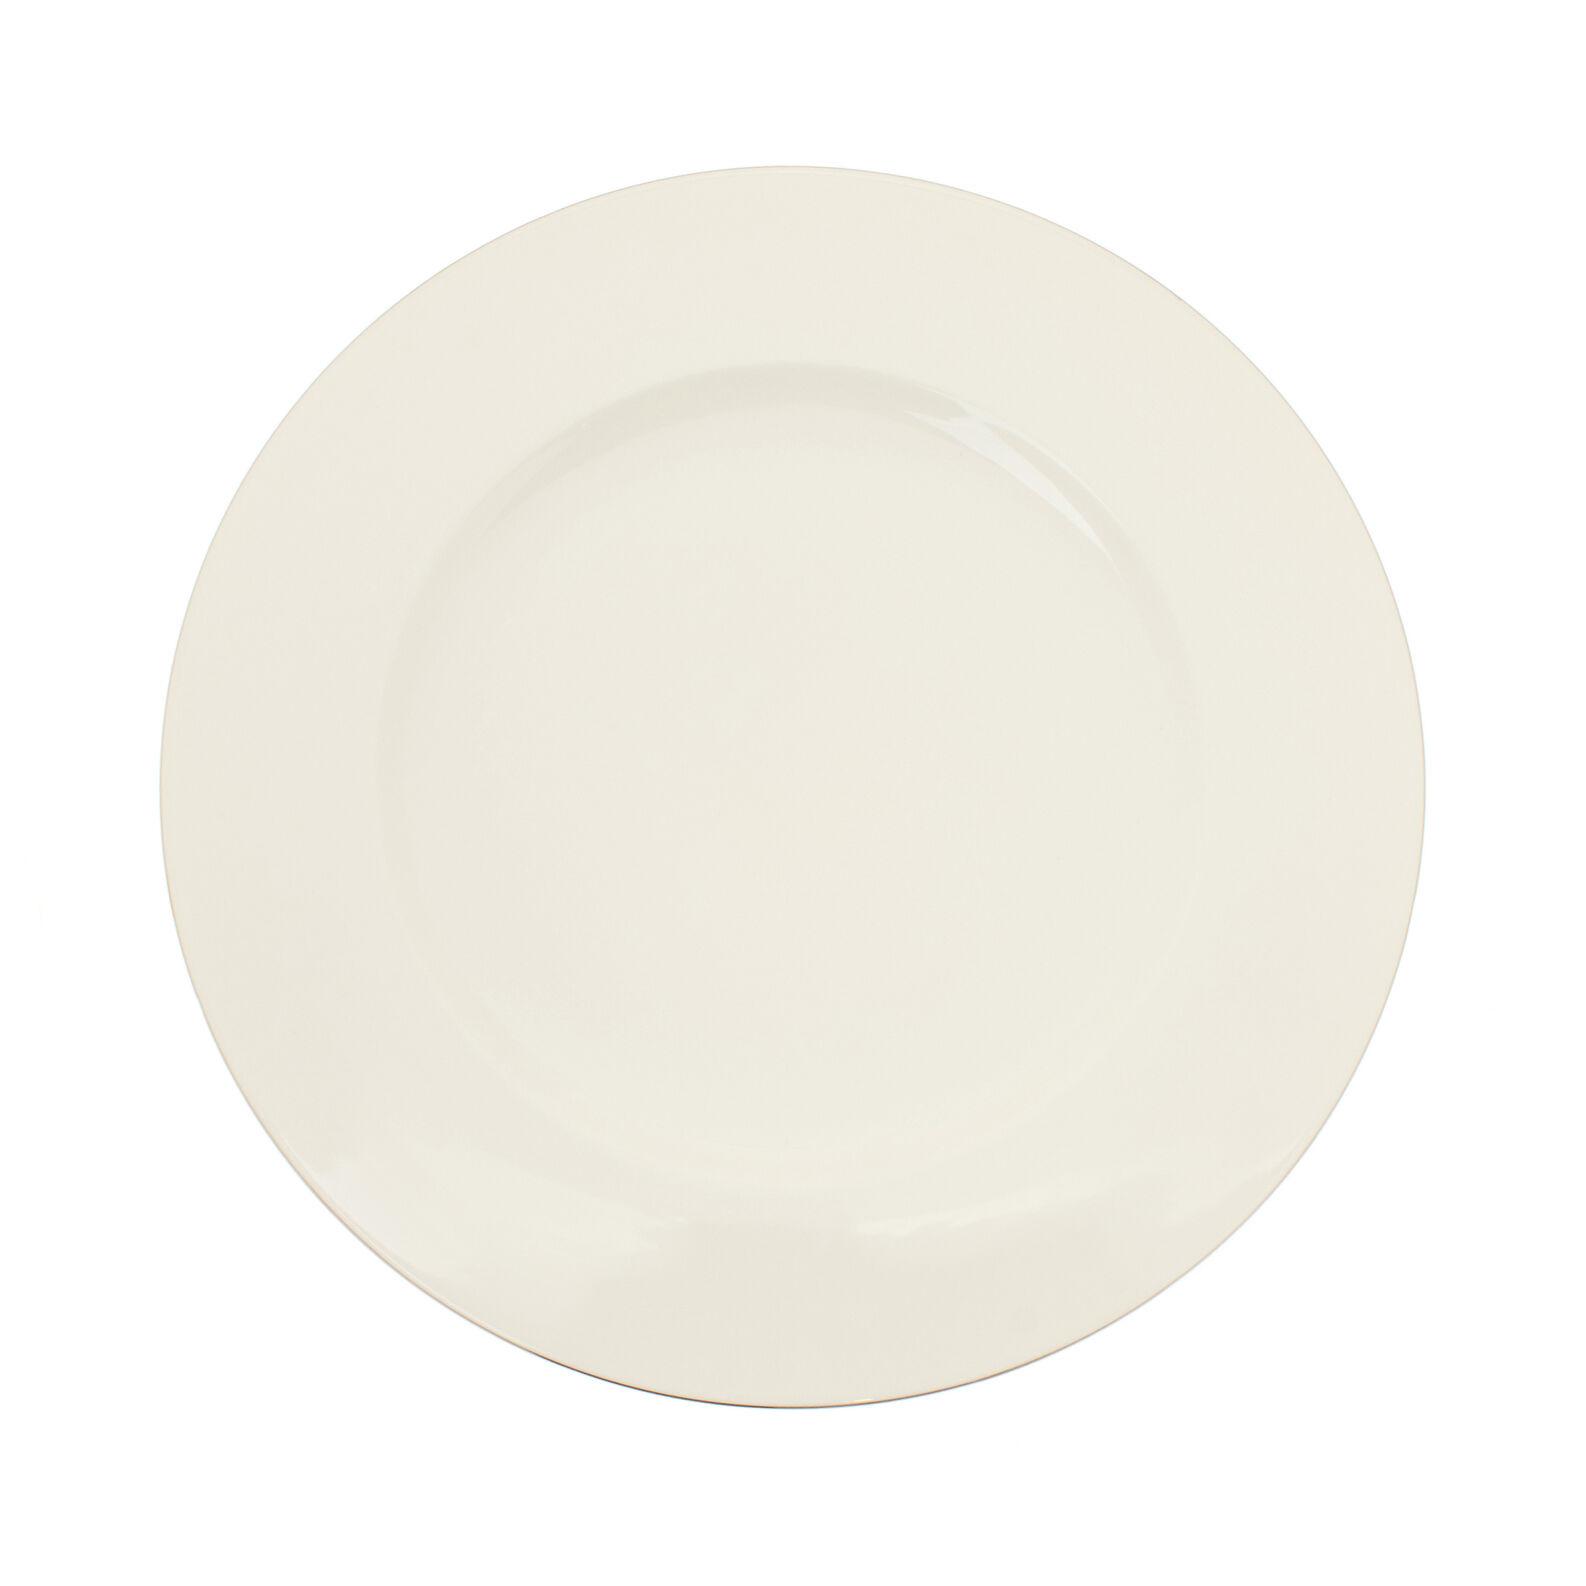 Roma new bone china serving platter